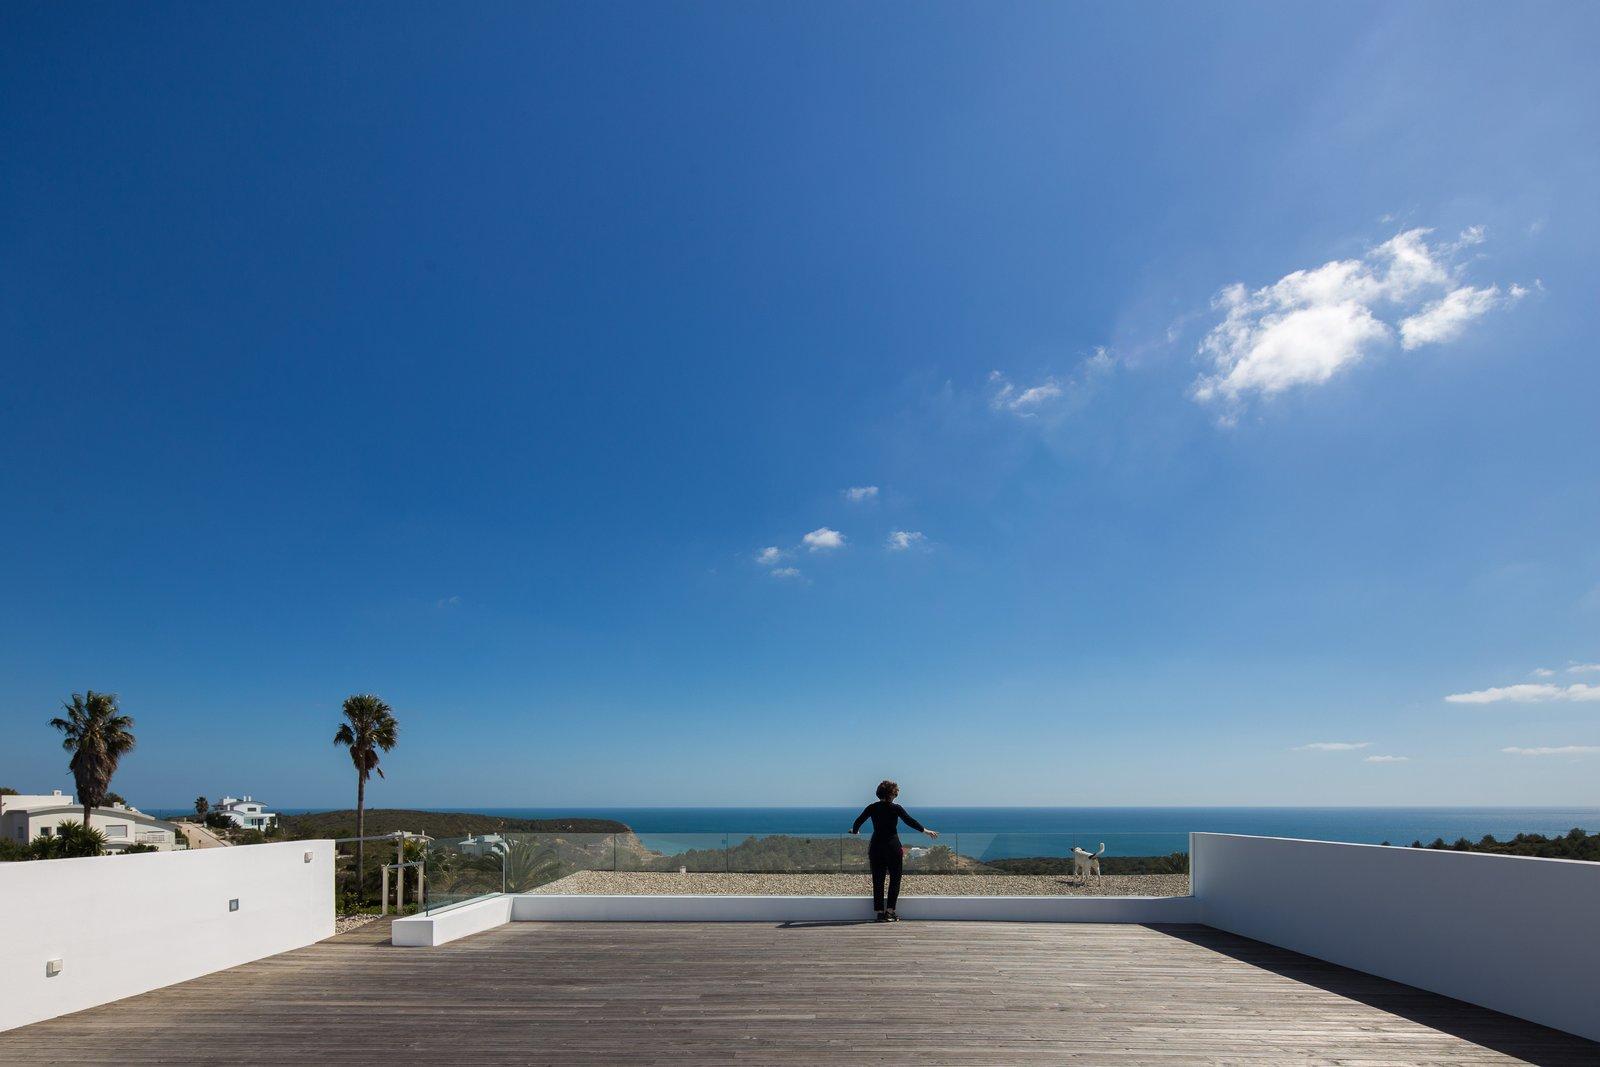 Villa GK rooftop deck